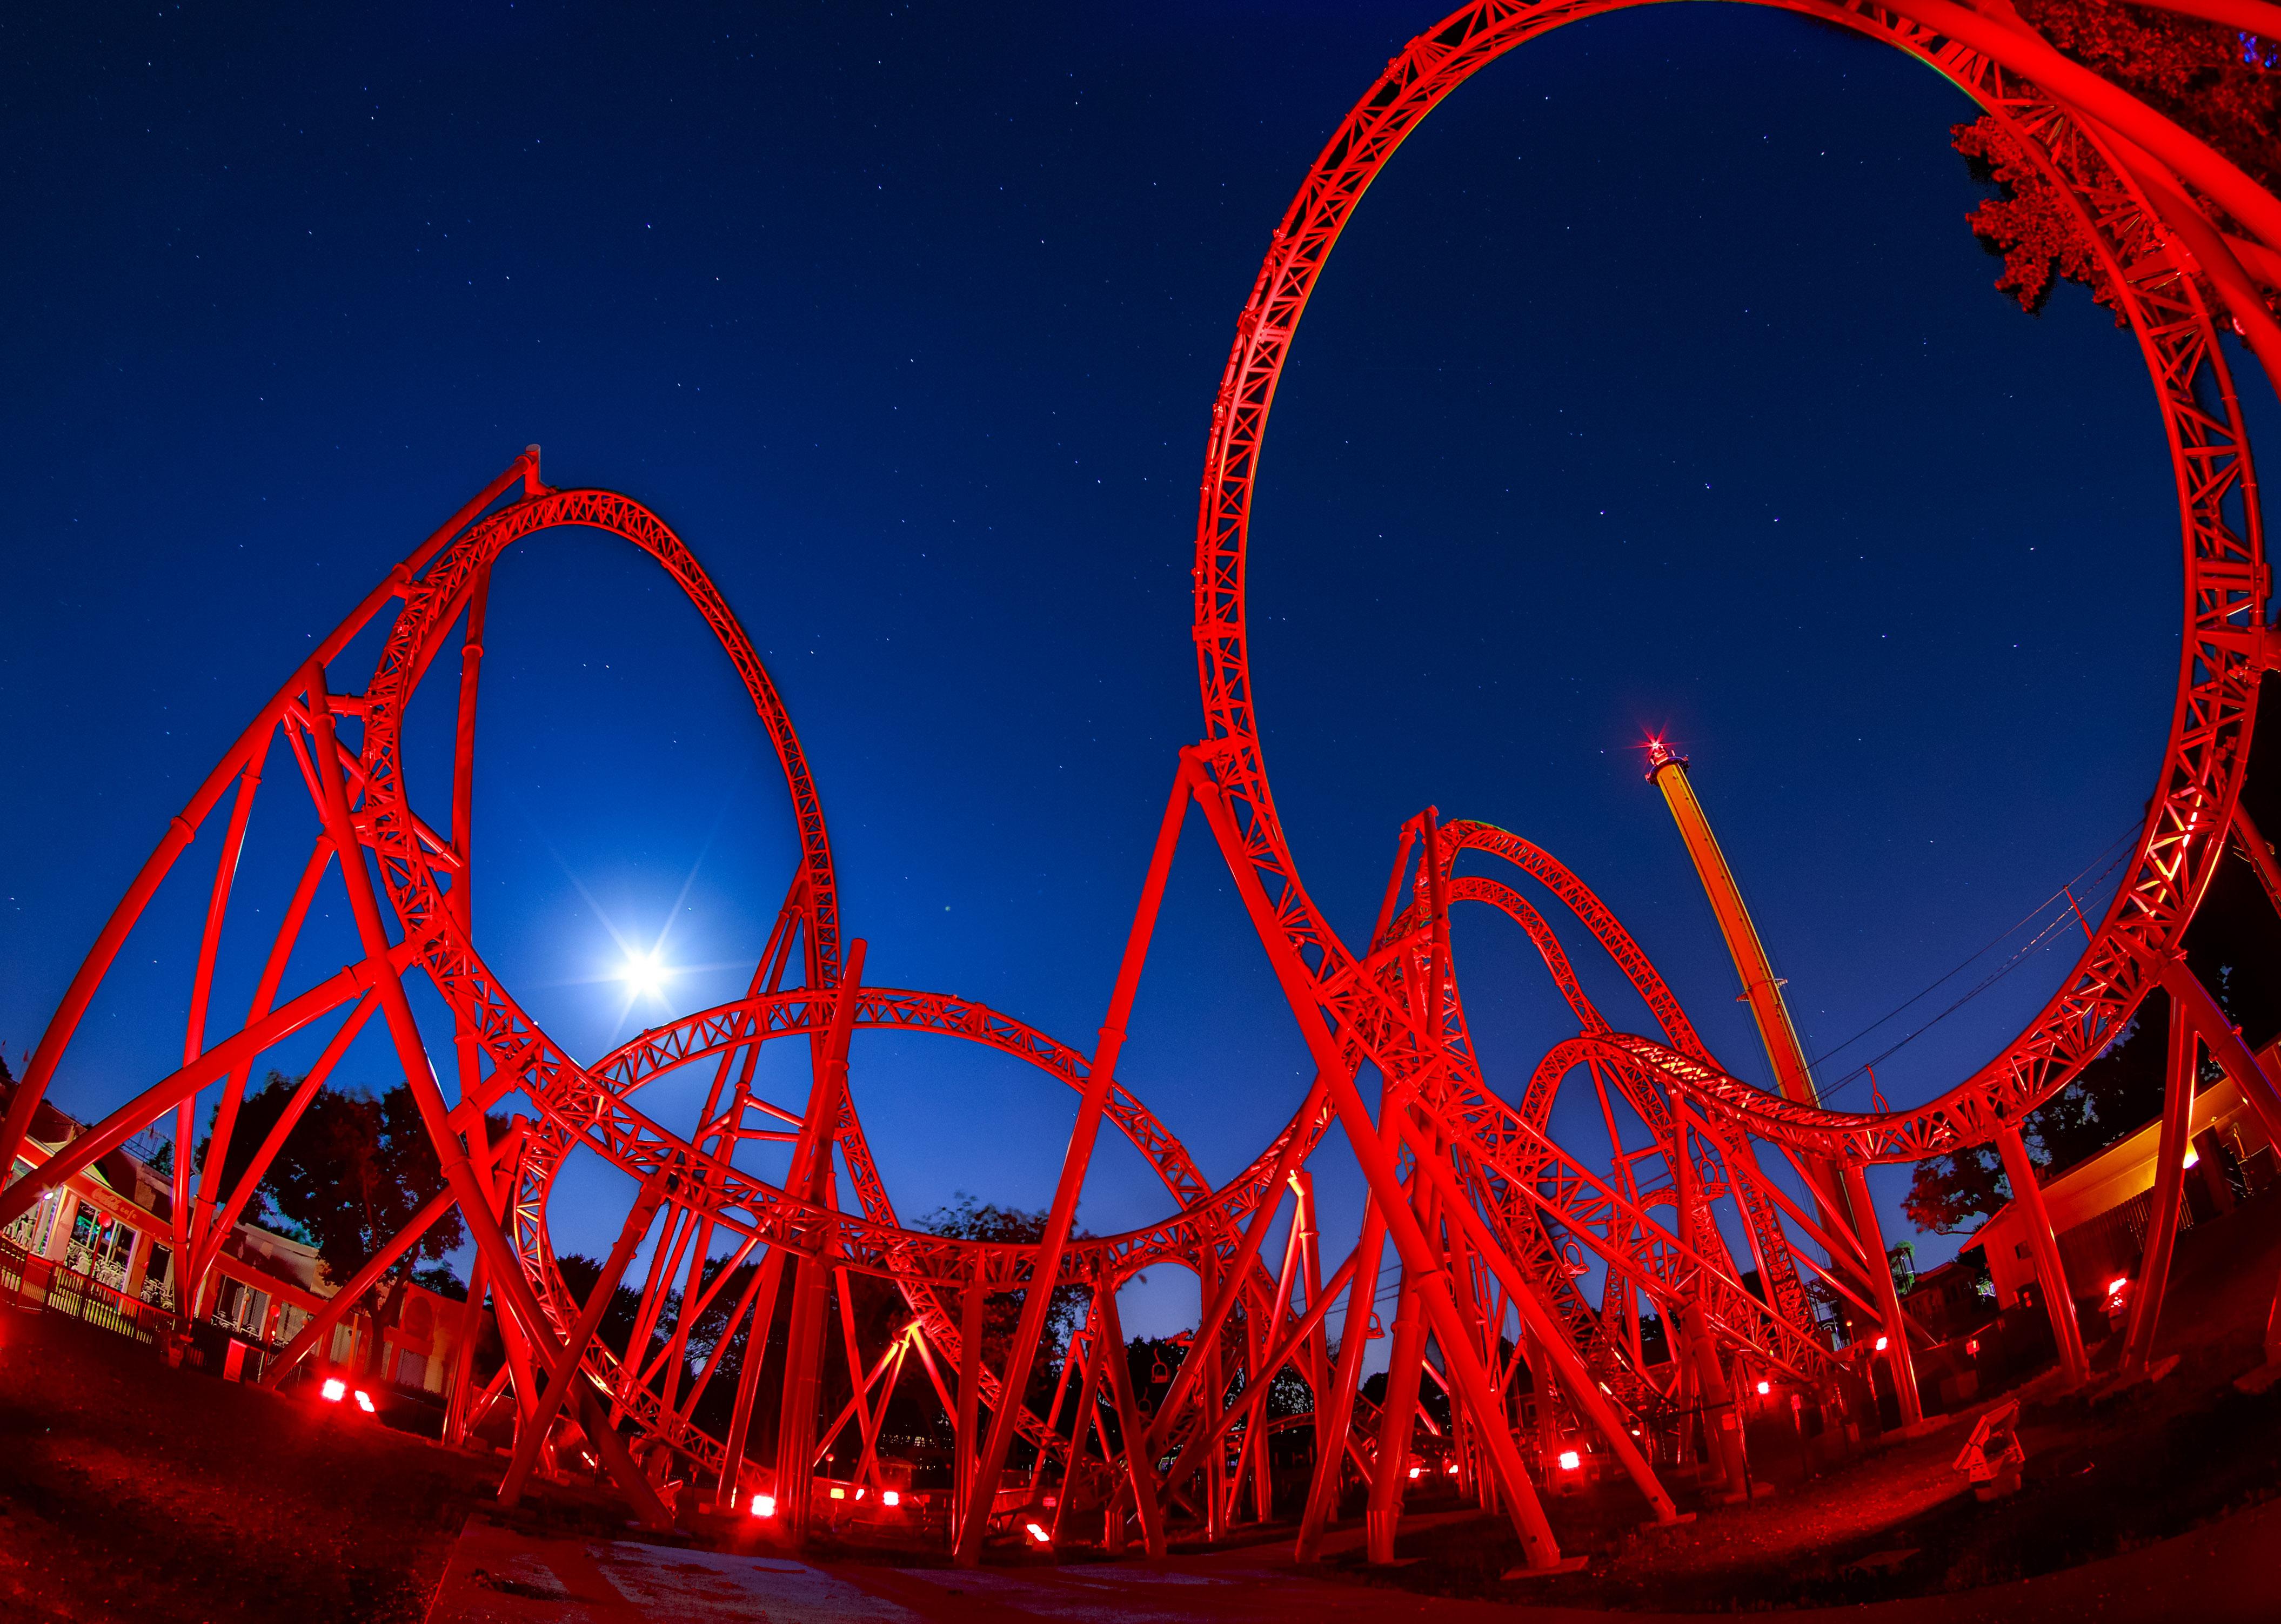 East Corner_0000_Red Coaster